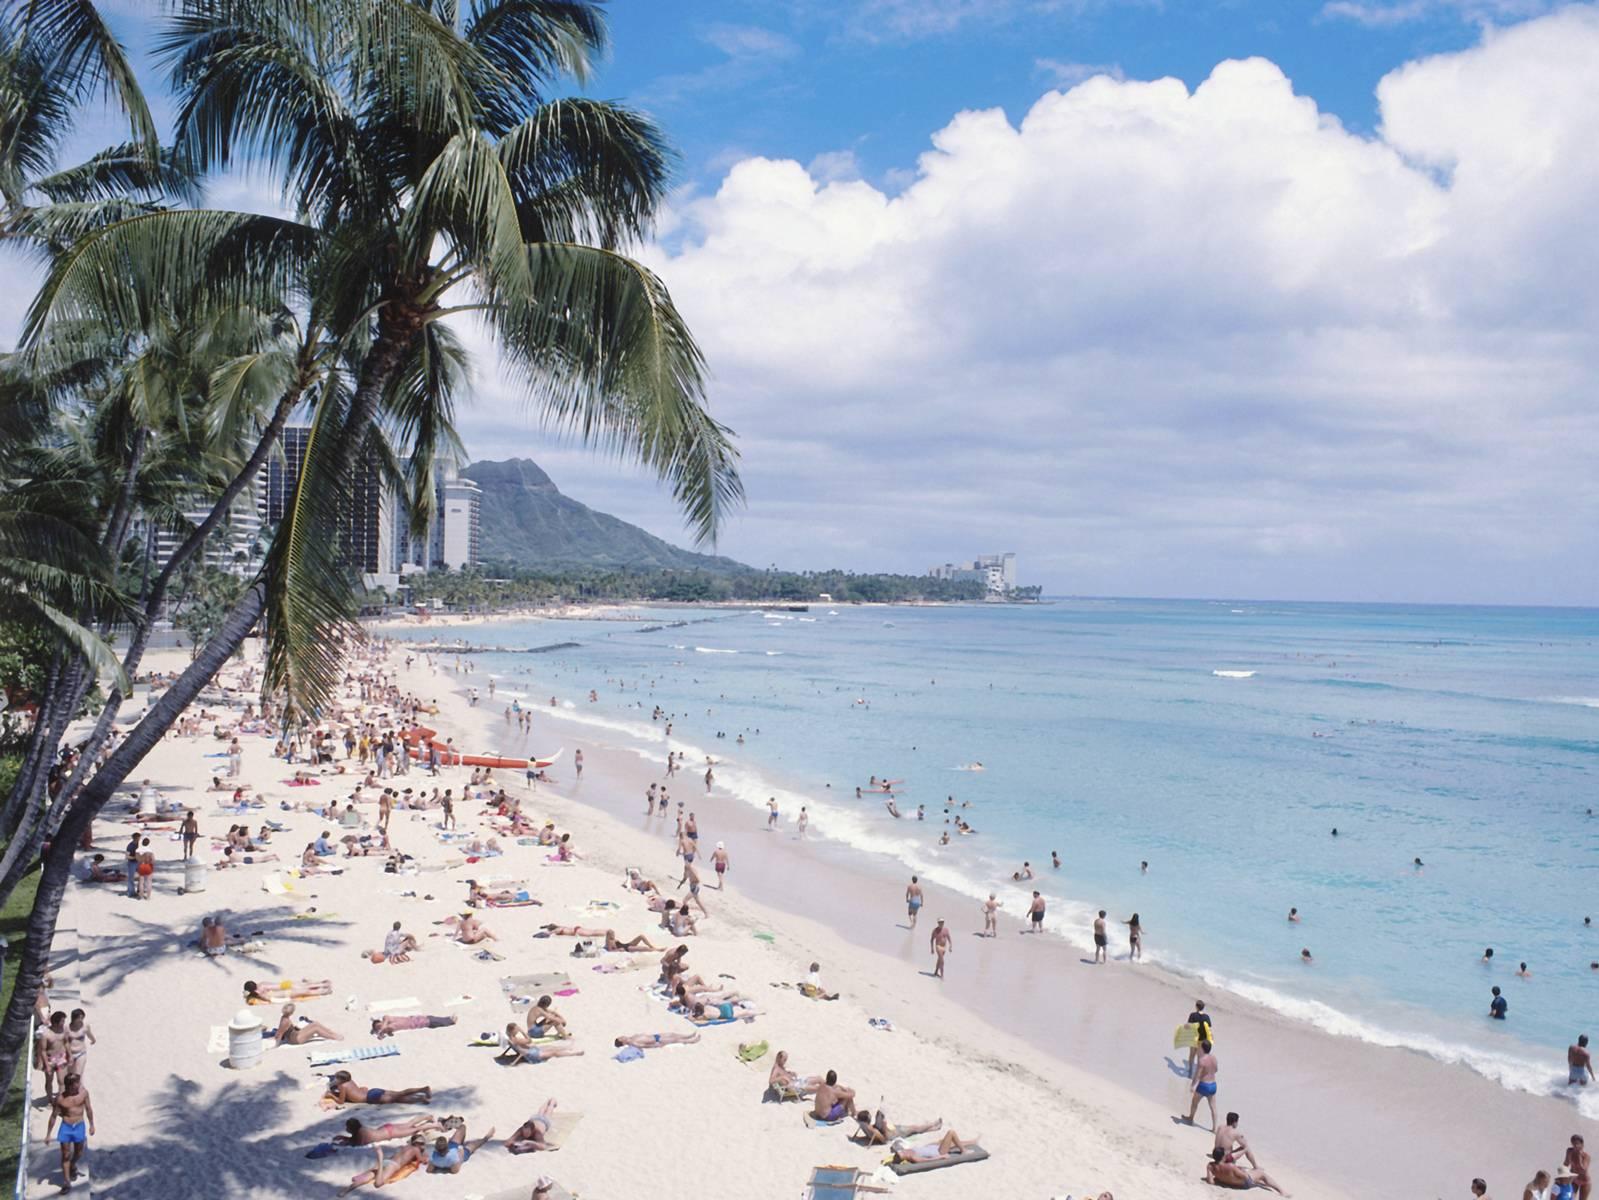 Oahu Tour to Grand Circle Island, Kualoa Ranch and Dole Pineapple Plantation